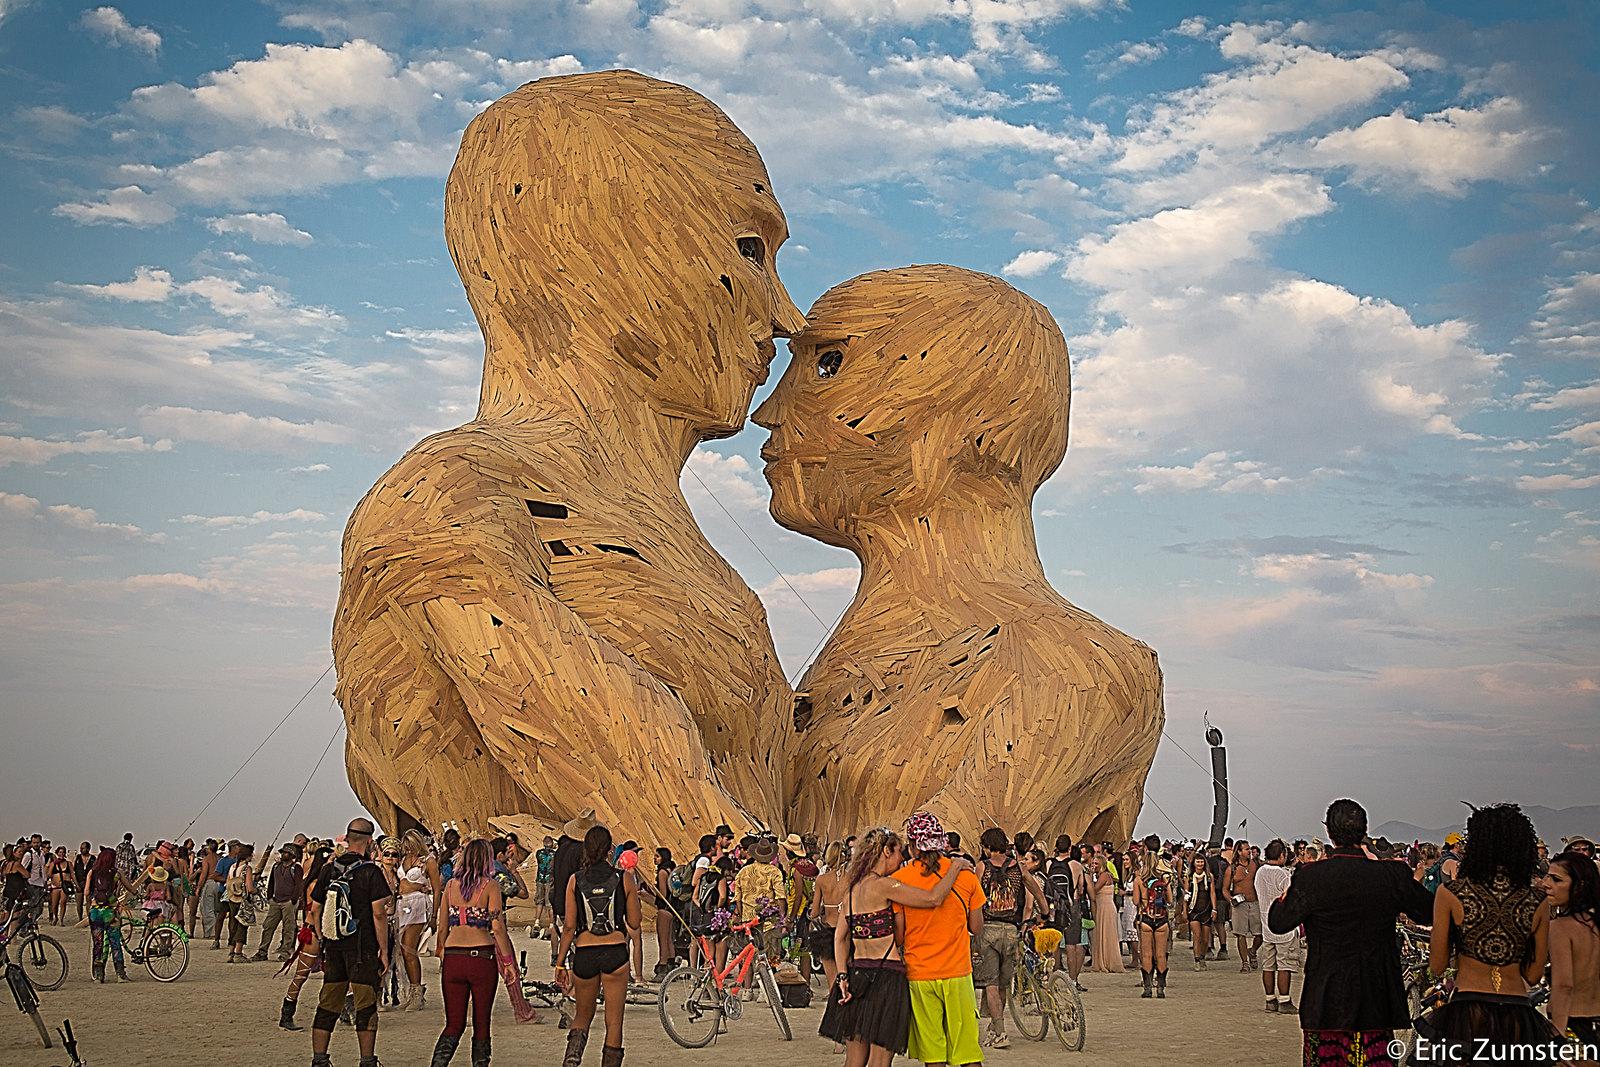 Embrace Art Project @Burning Man